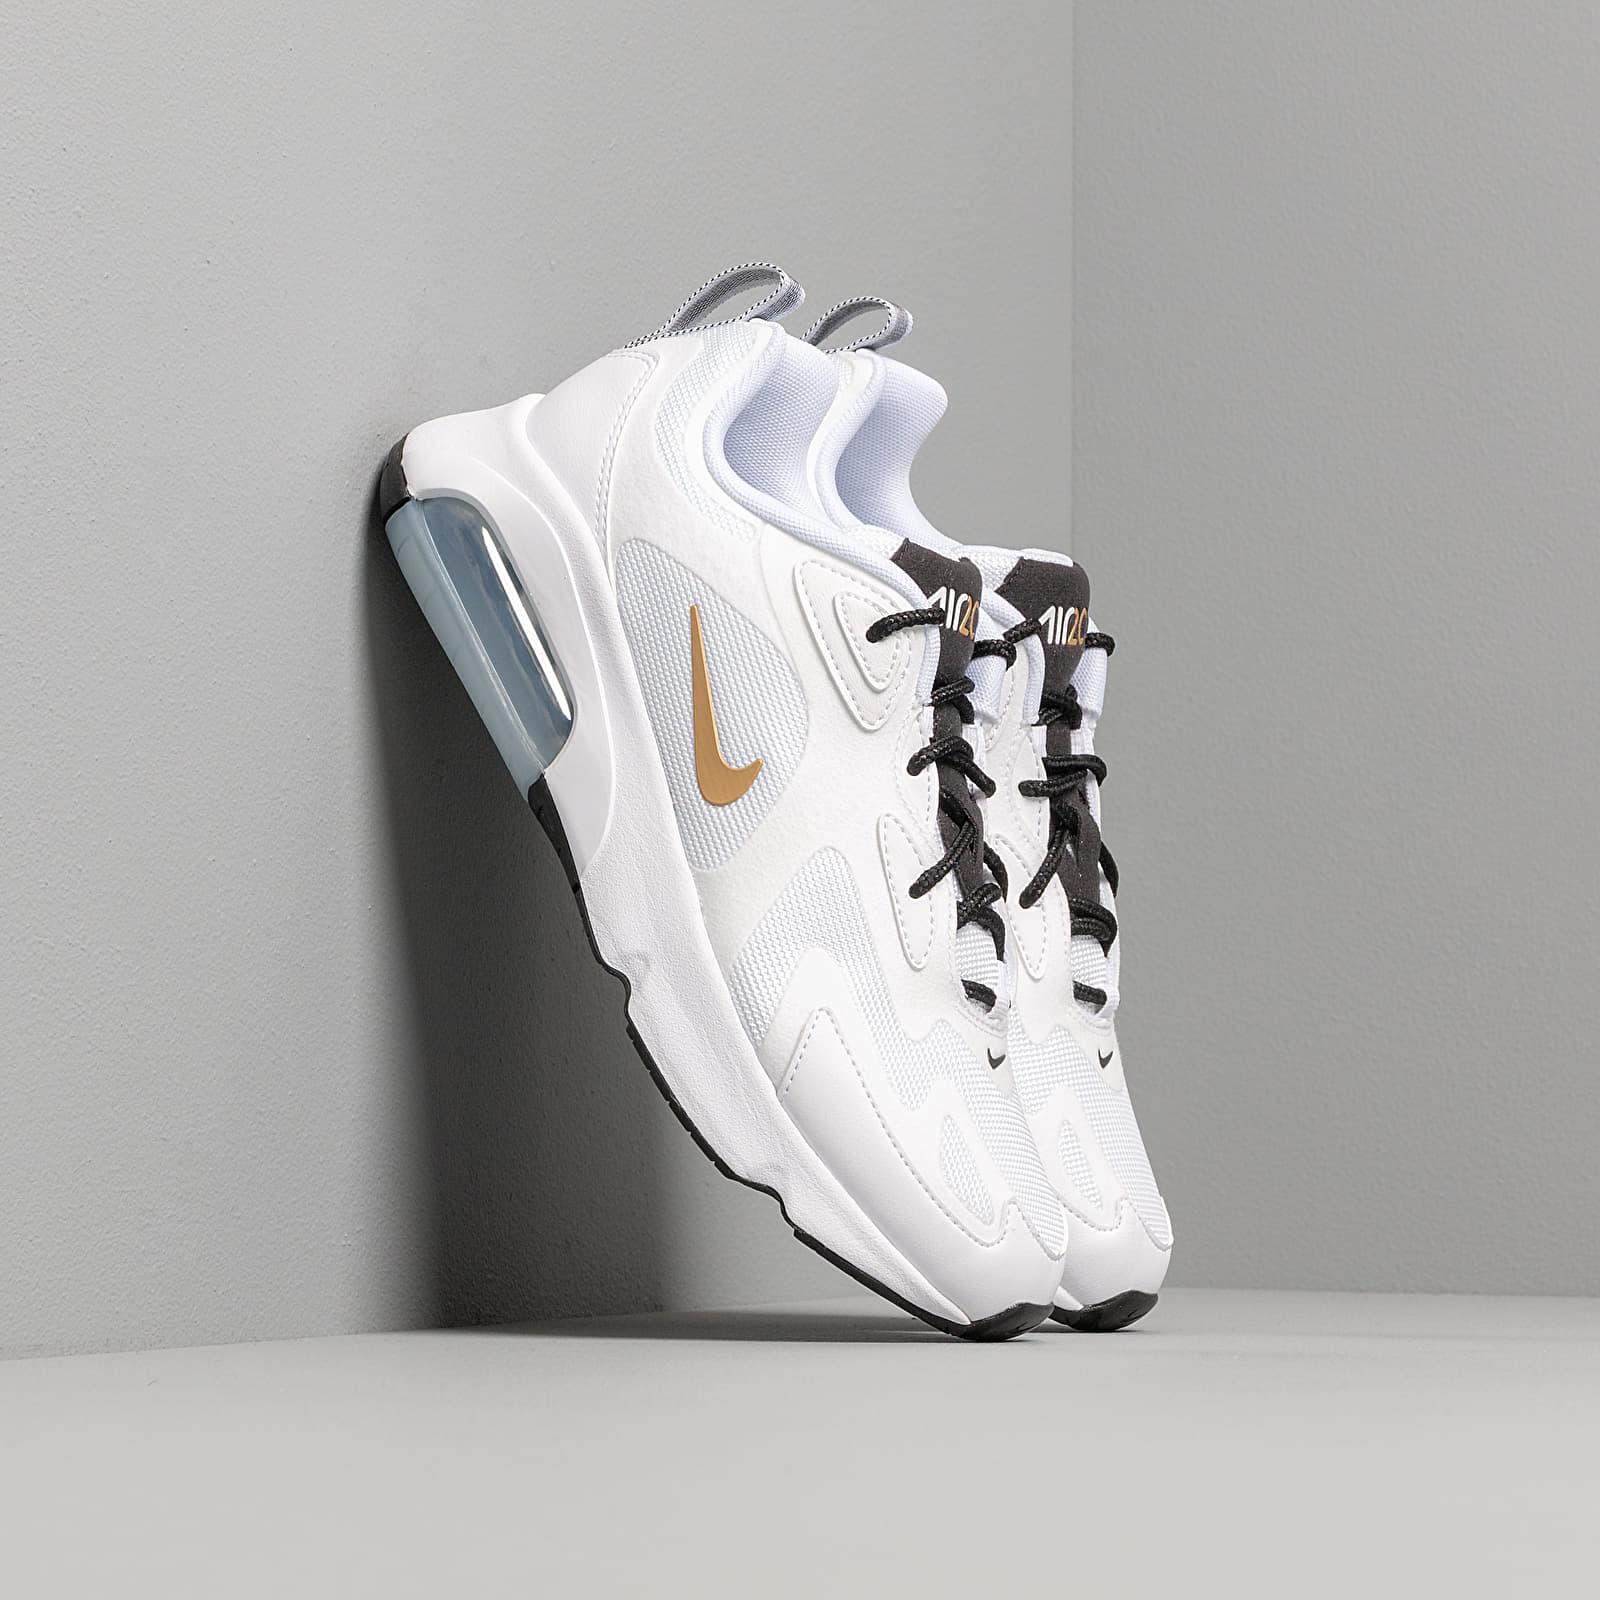 Nike W Air Max 200 White Metallic Gold Black | Footshop